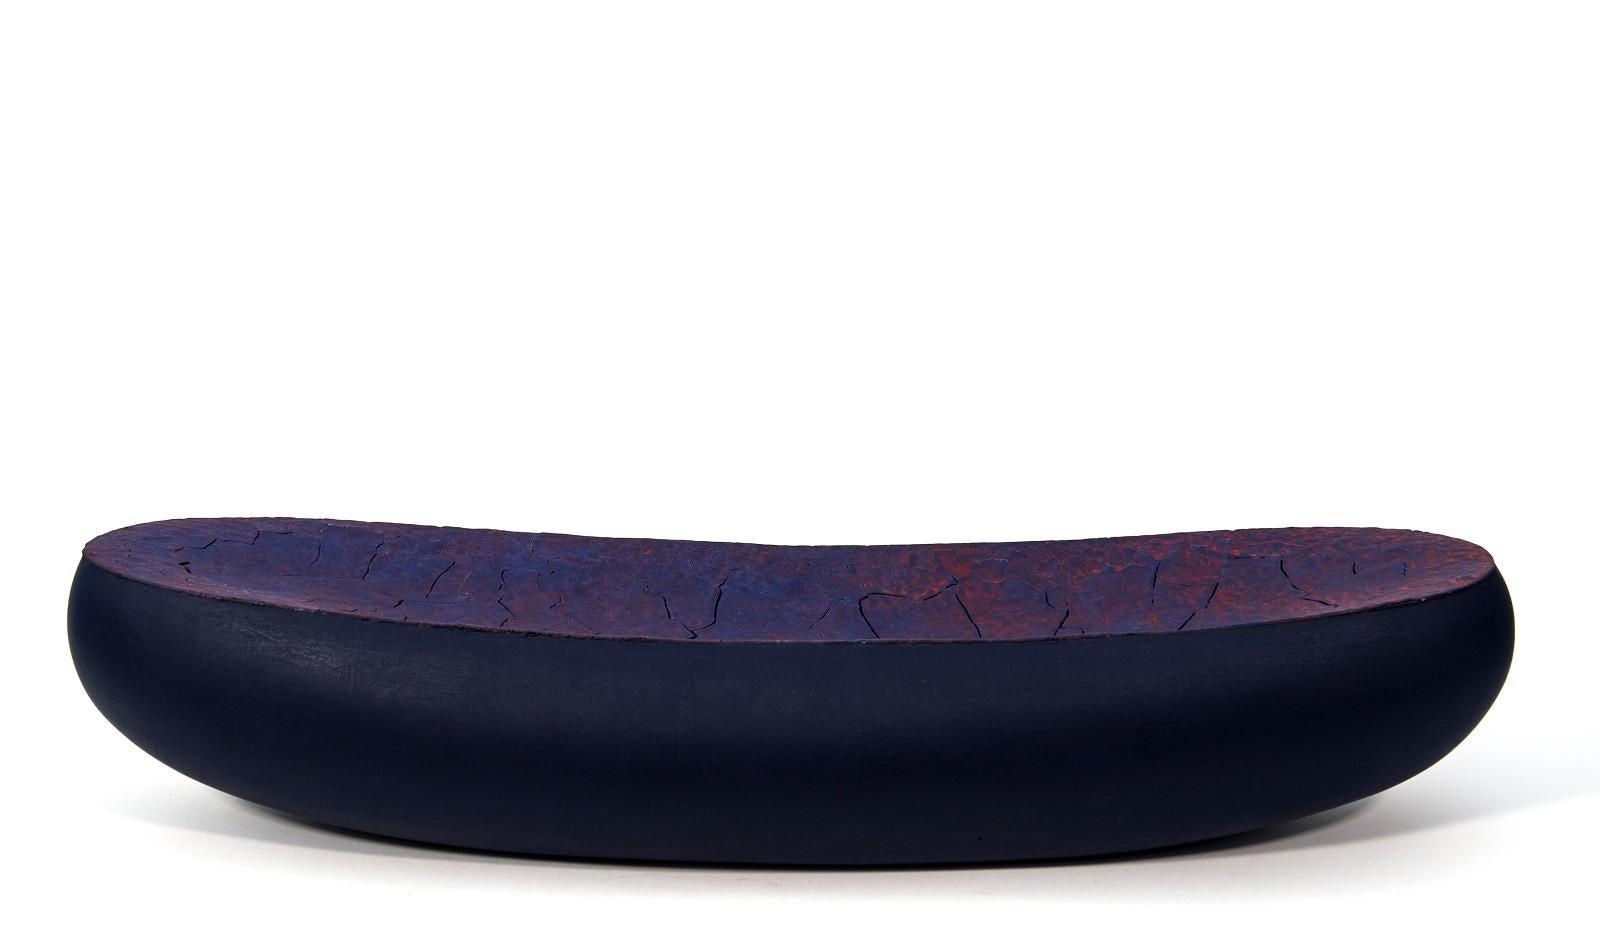 Ellesmere - black, purple, orange, textured, ceramic tabletop vessel